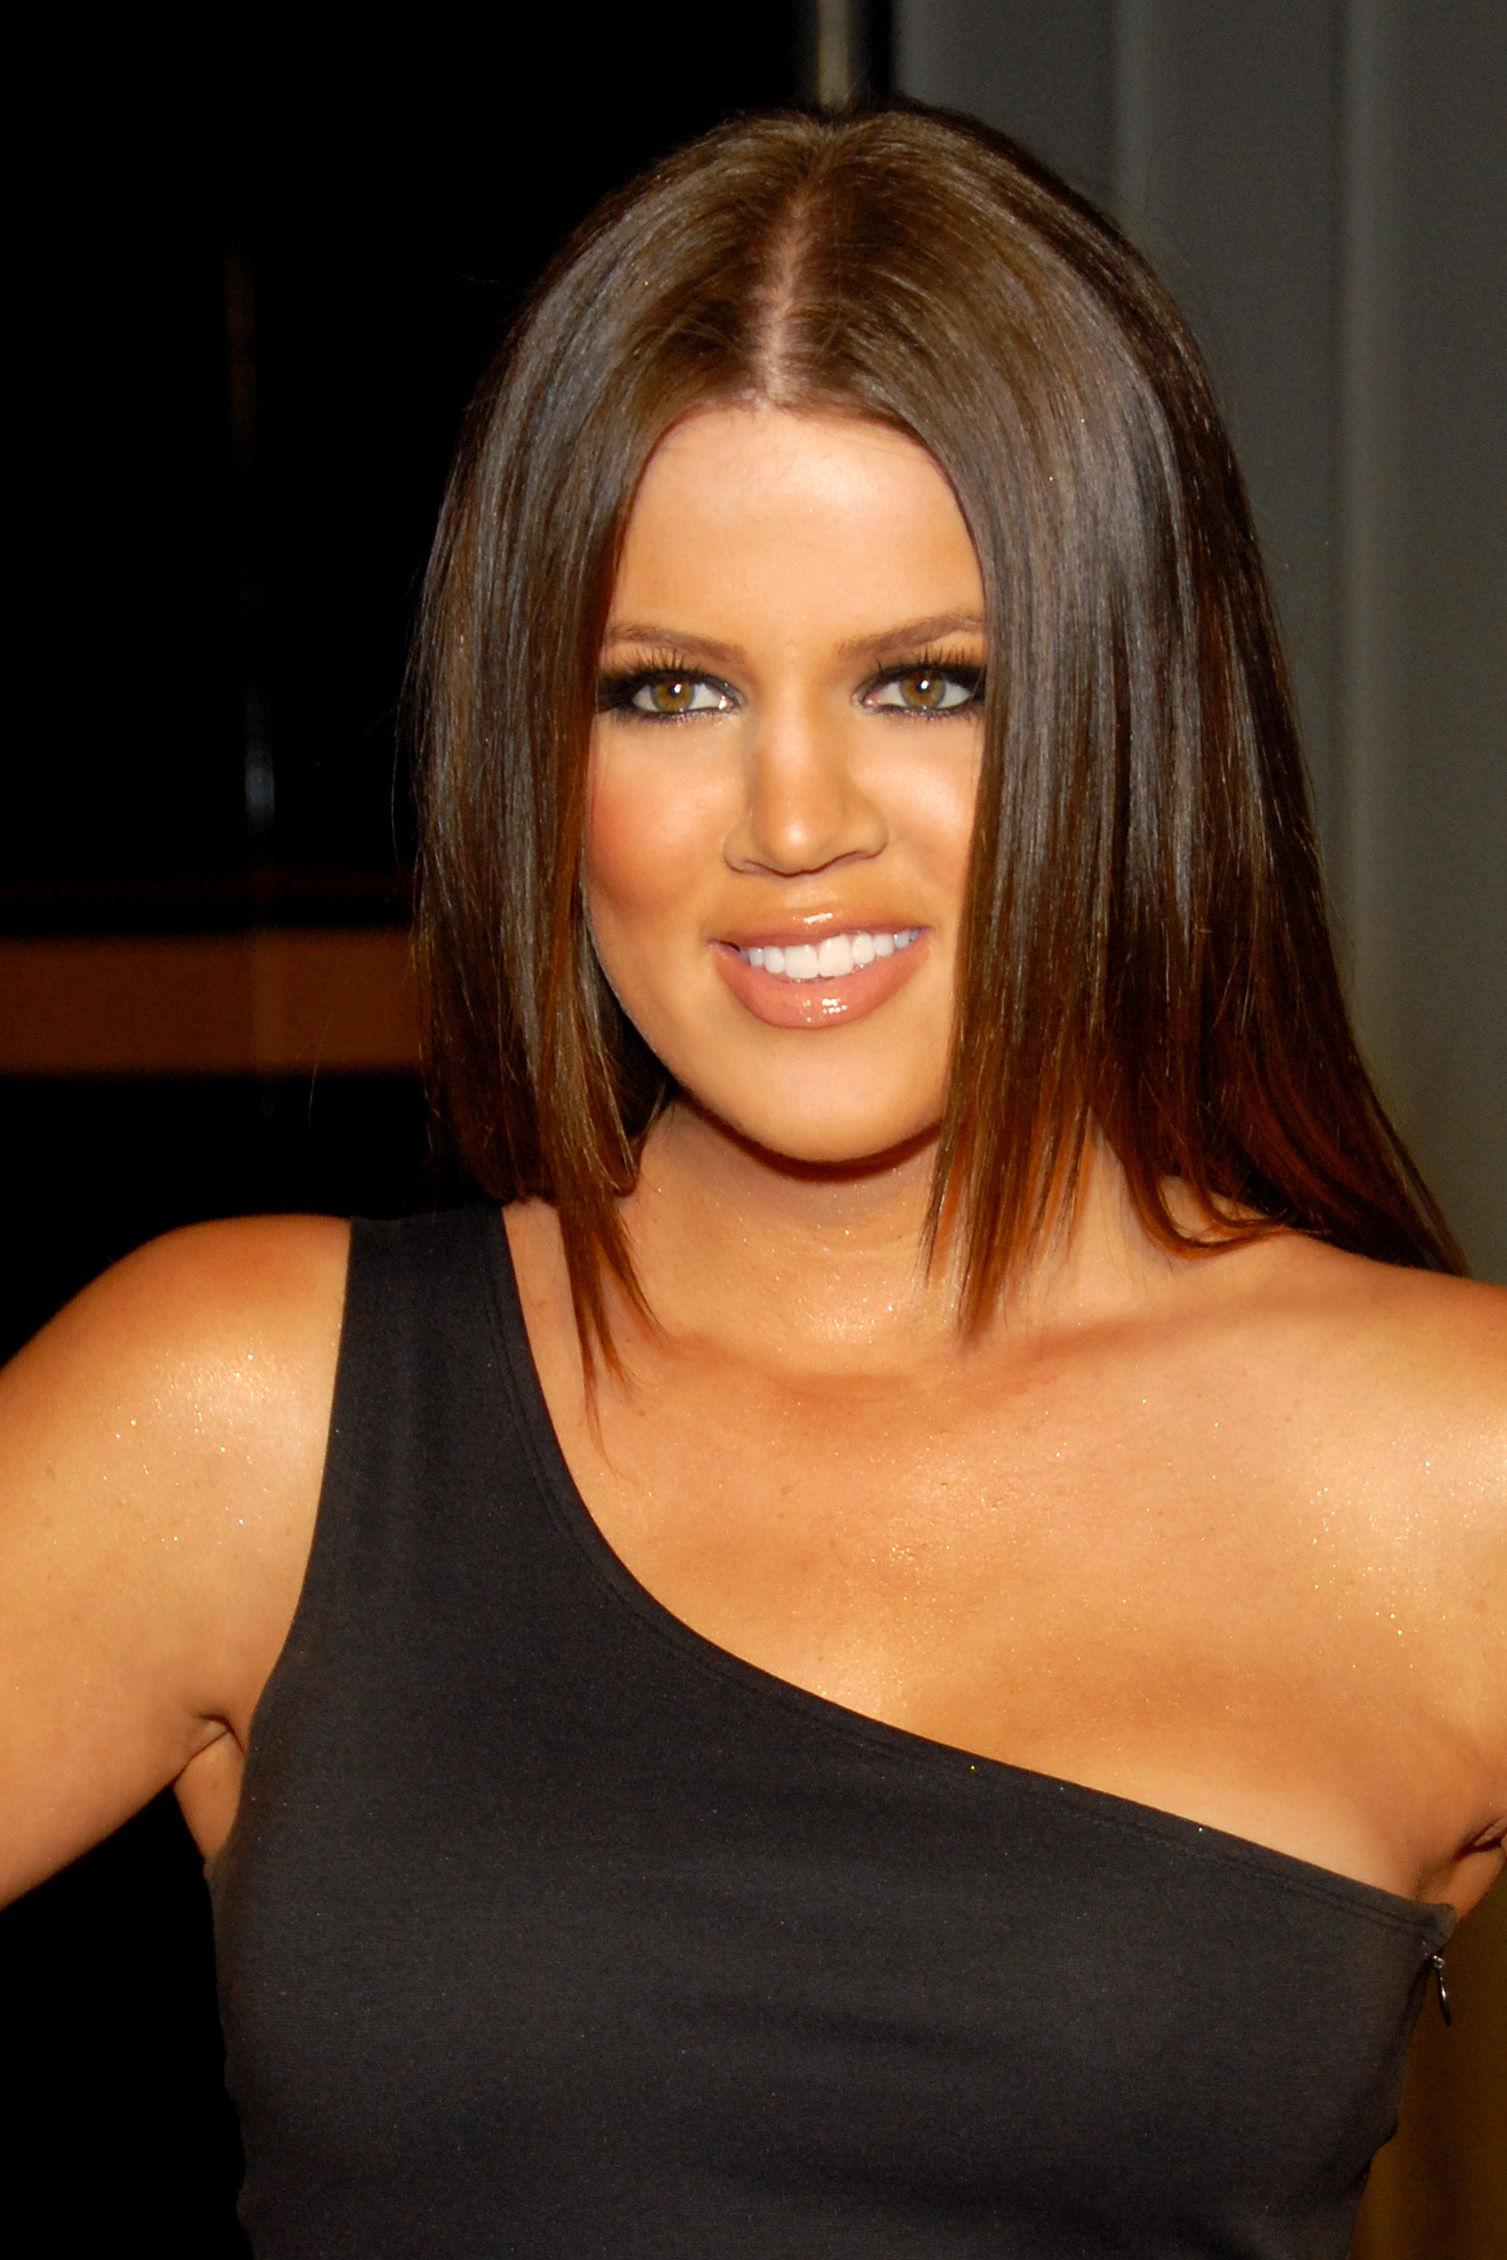 Photo of Khloé Kardashian: American television personality